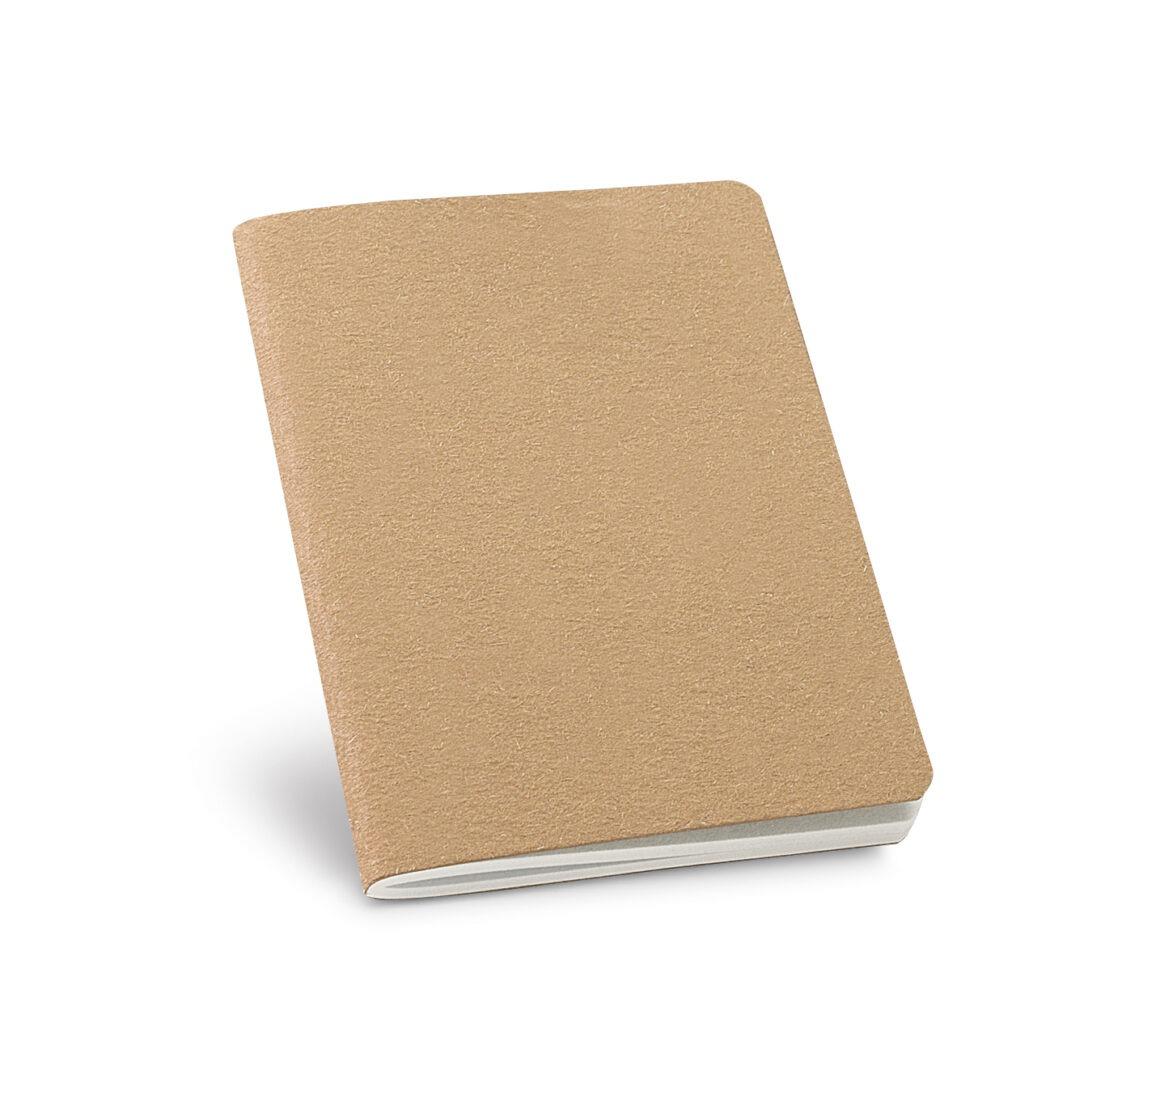 Tregoose Eco-Notepad Product Code GP93461